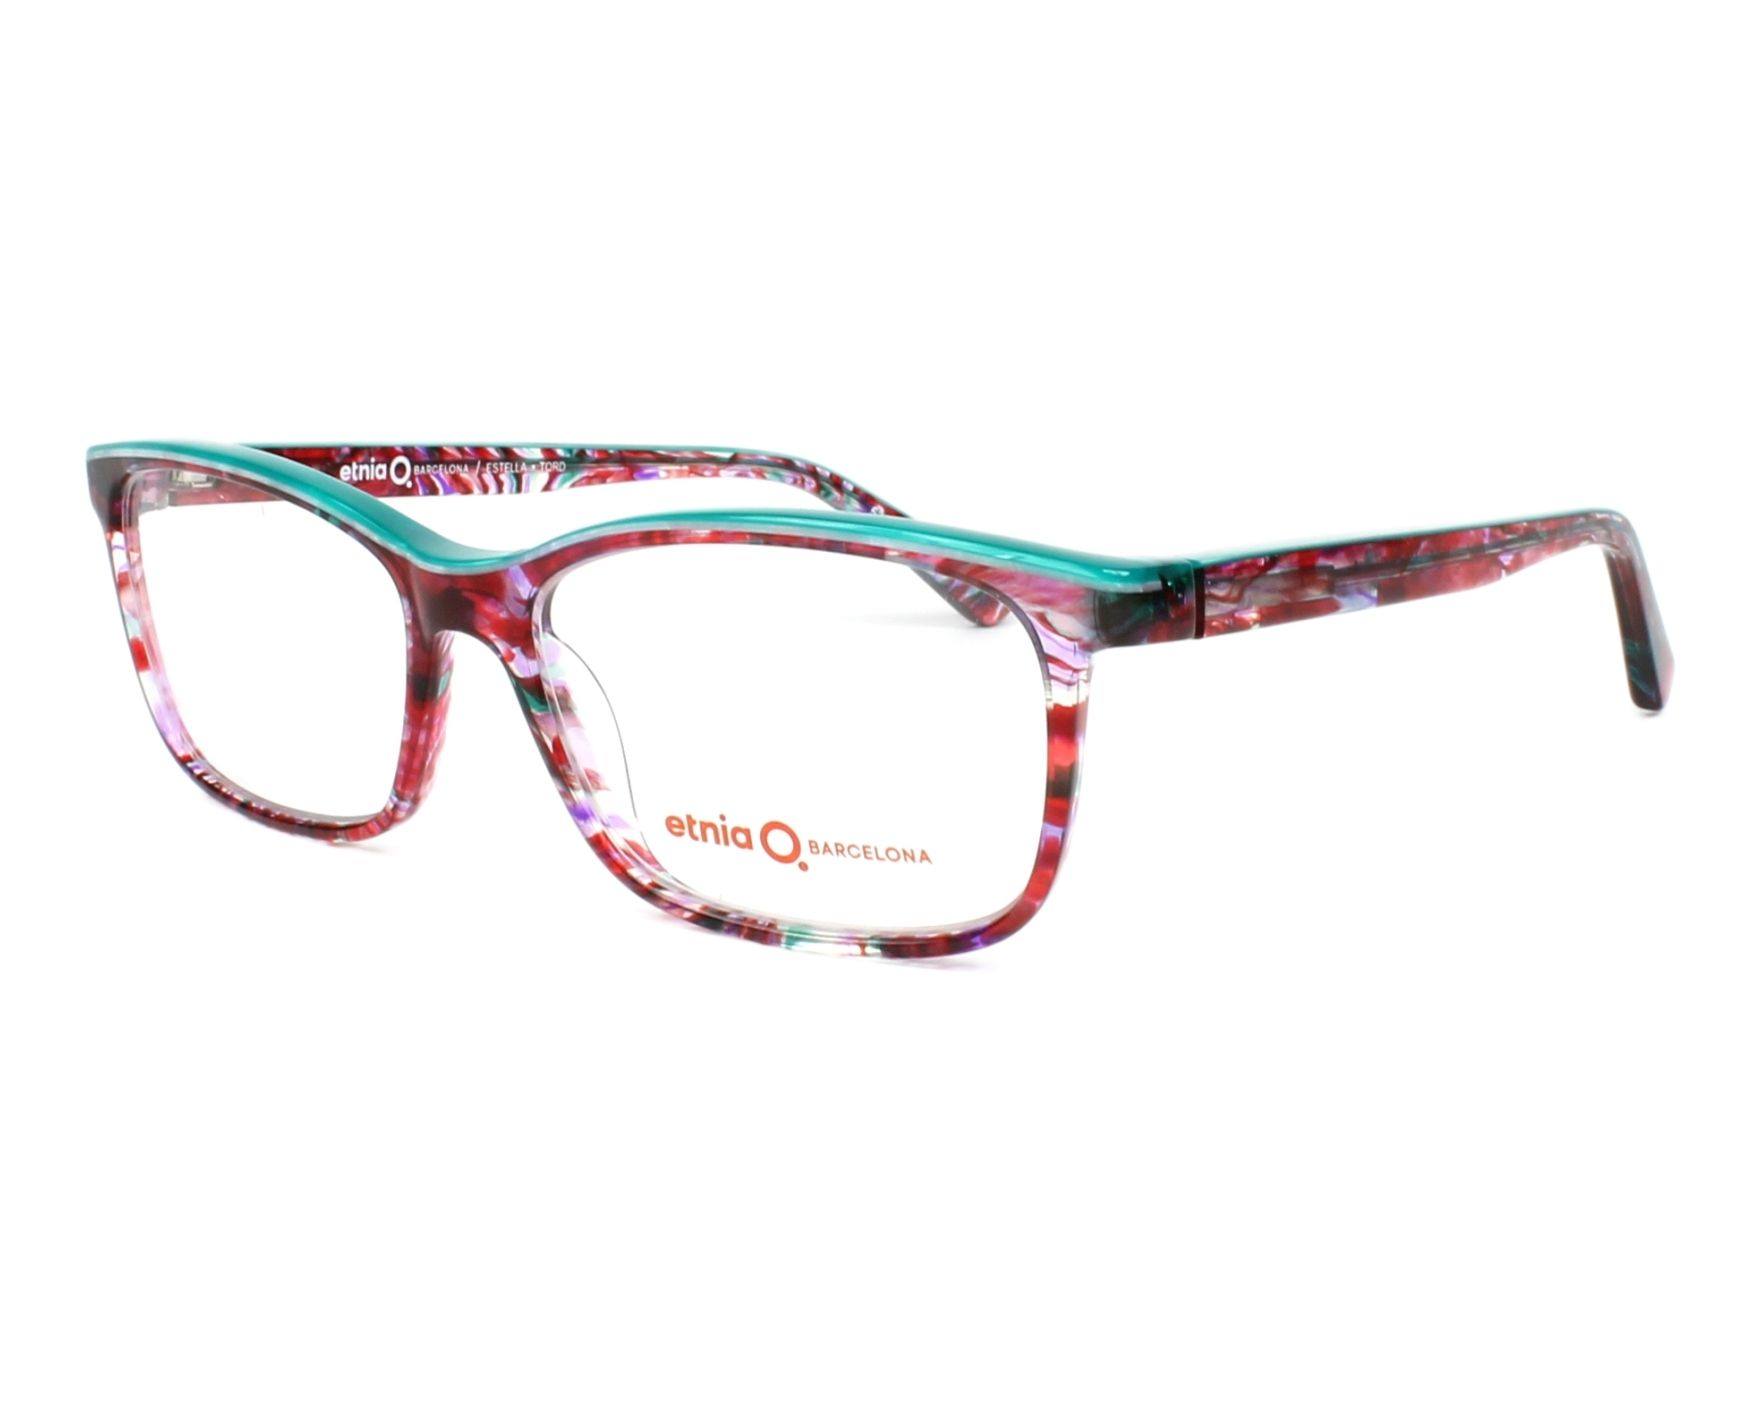 Etnia Barcelona Eyeglasses Turquoise ESTELLA TQRD - Visionet US